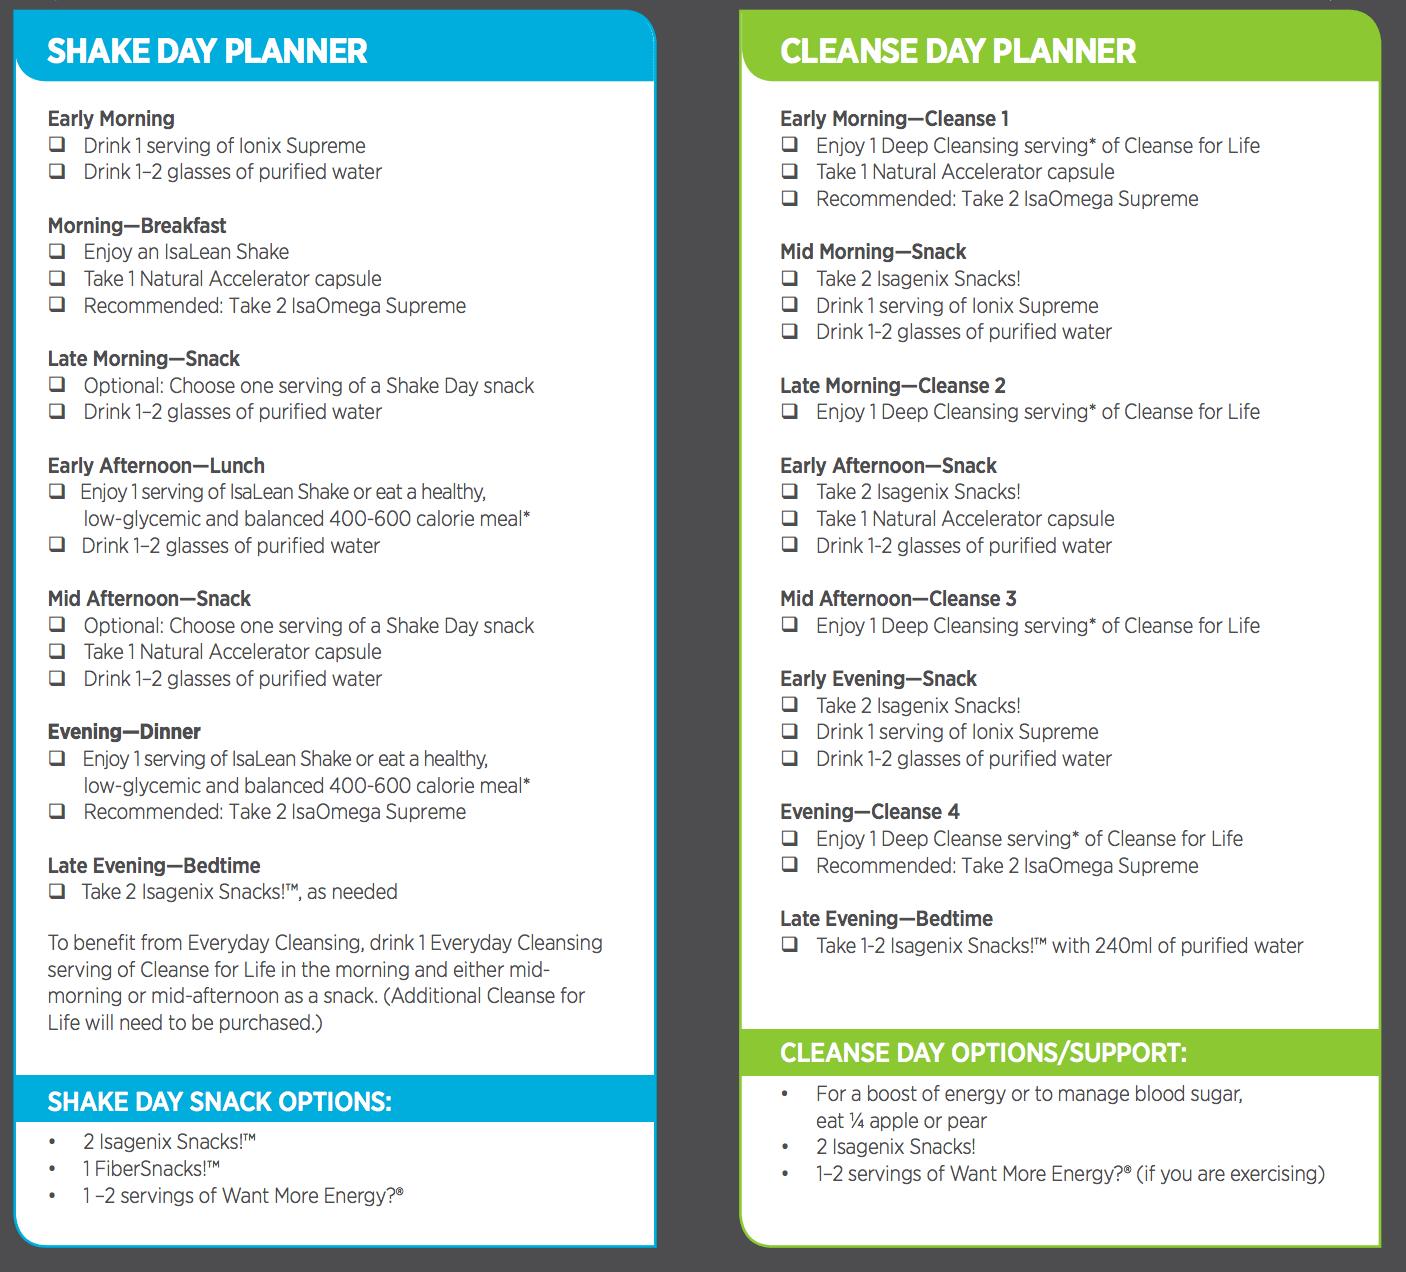 Vimpat Schedule Drug: Isagenix Shake And Cleanse Pak Schedule Inside Isagenix Shake Day Schedule Printable